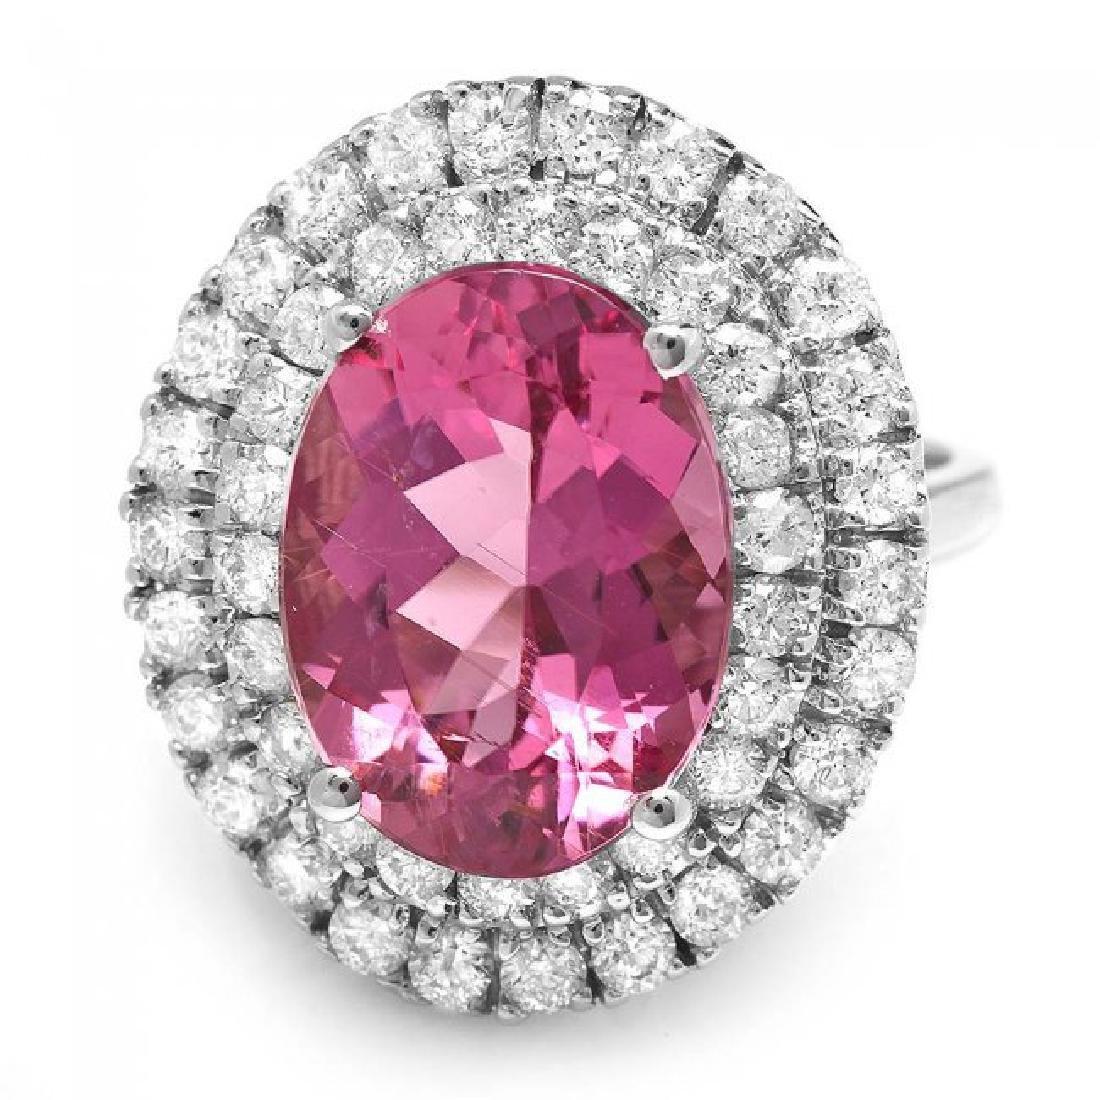 14k Gold 6.55ct Tourmaline 1.45ct Diamond Ring - 3